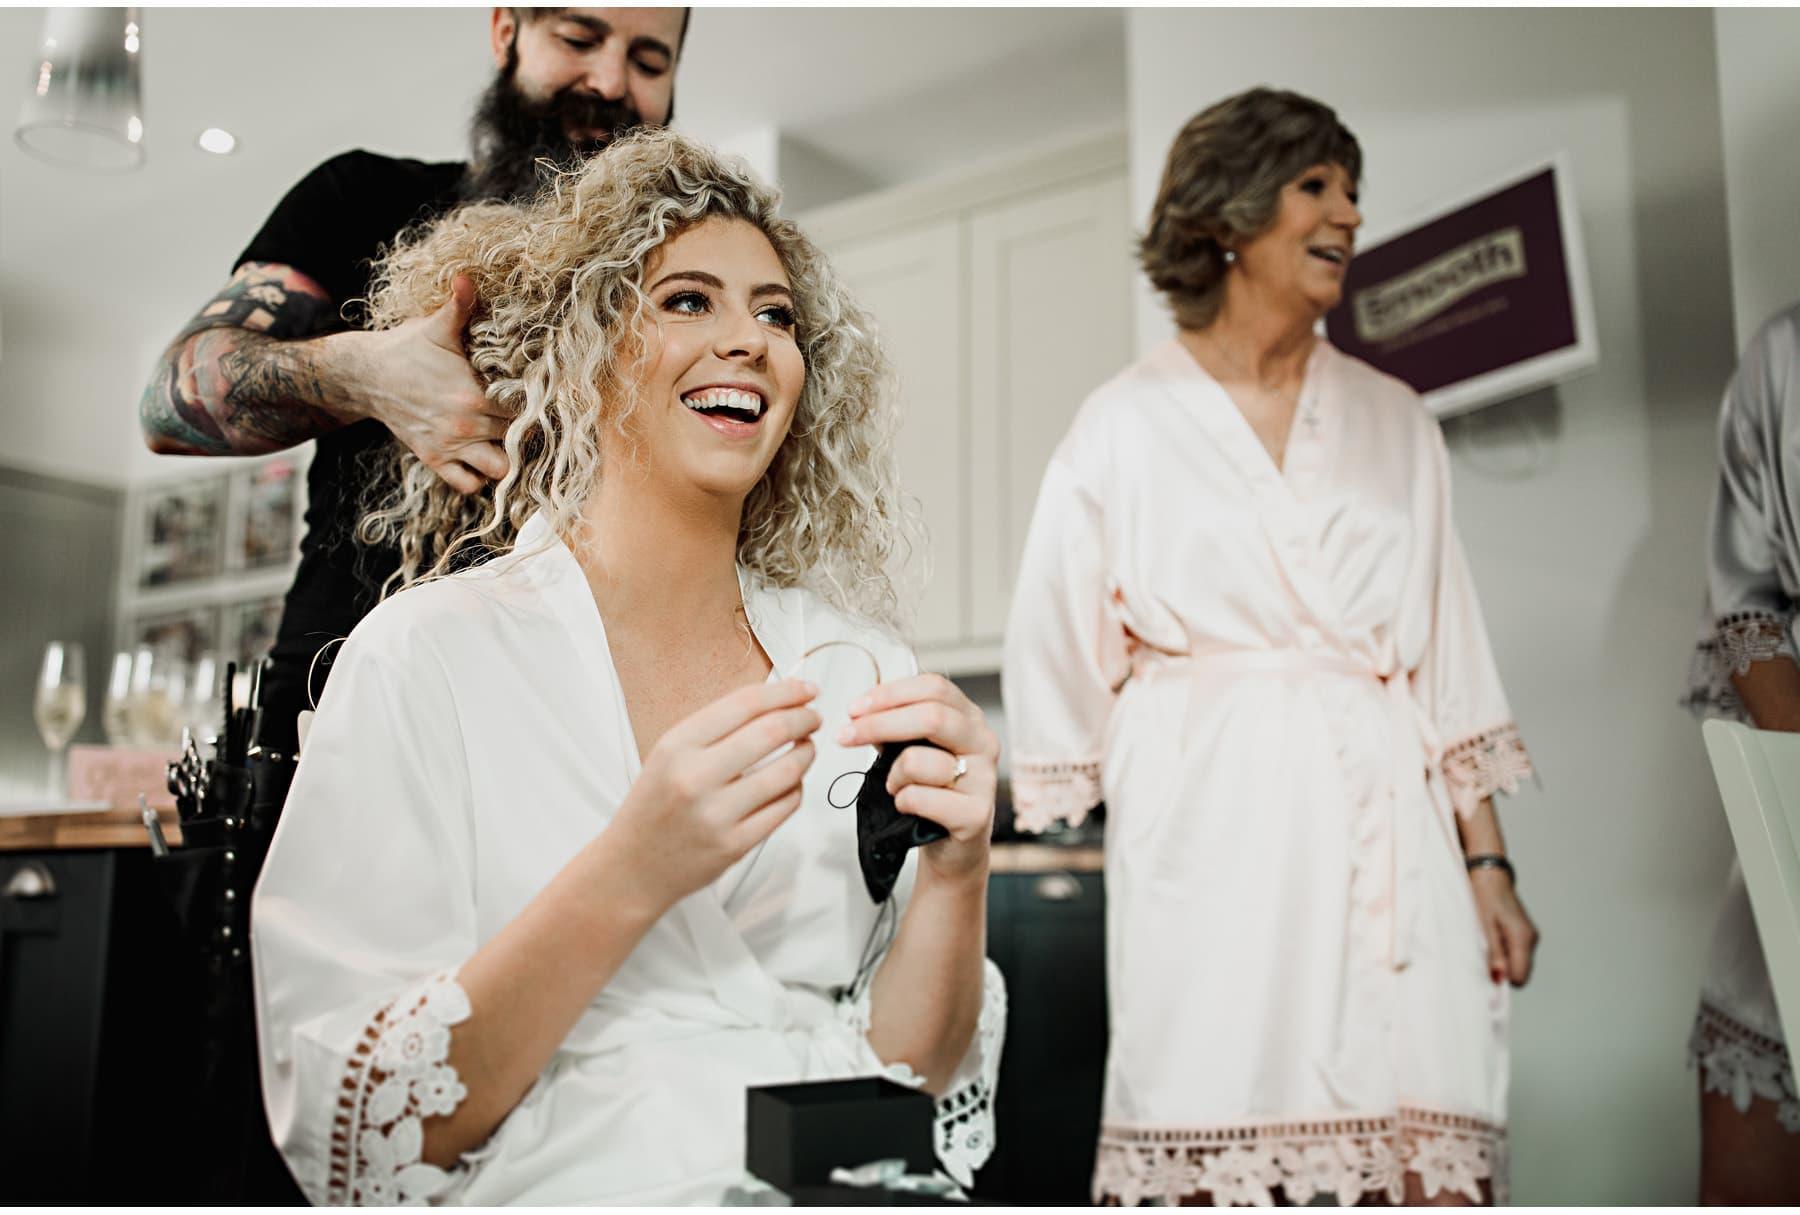 the bride enjoying her birdal preparations